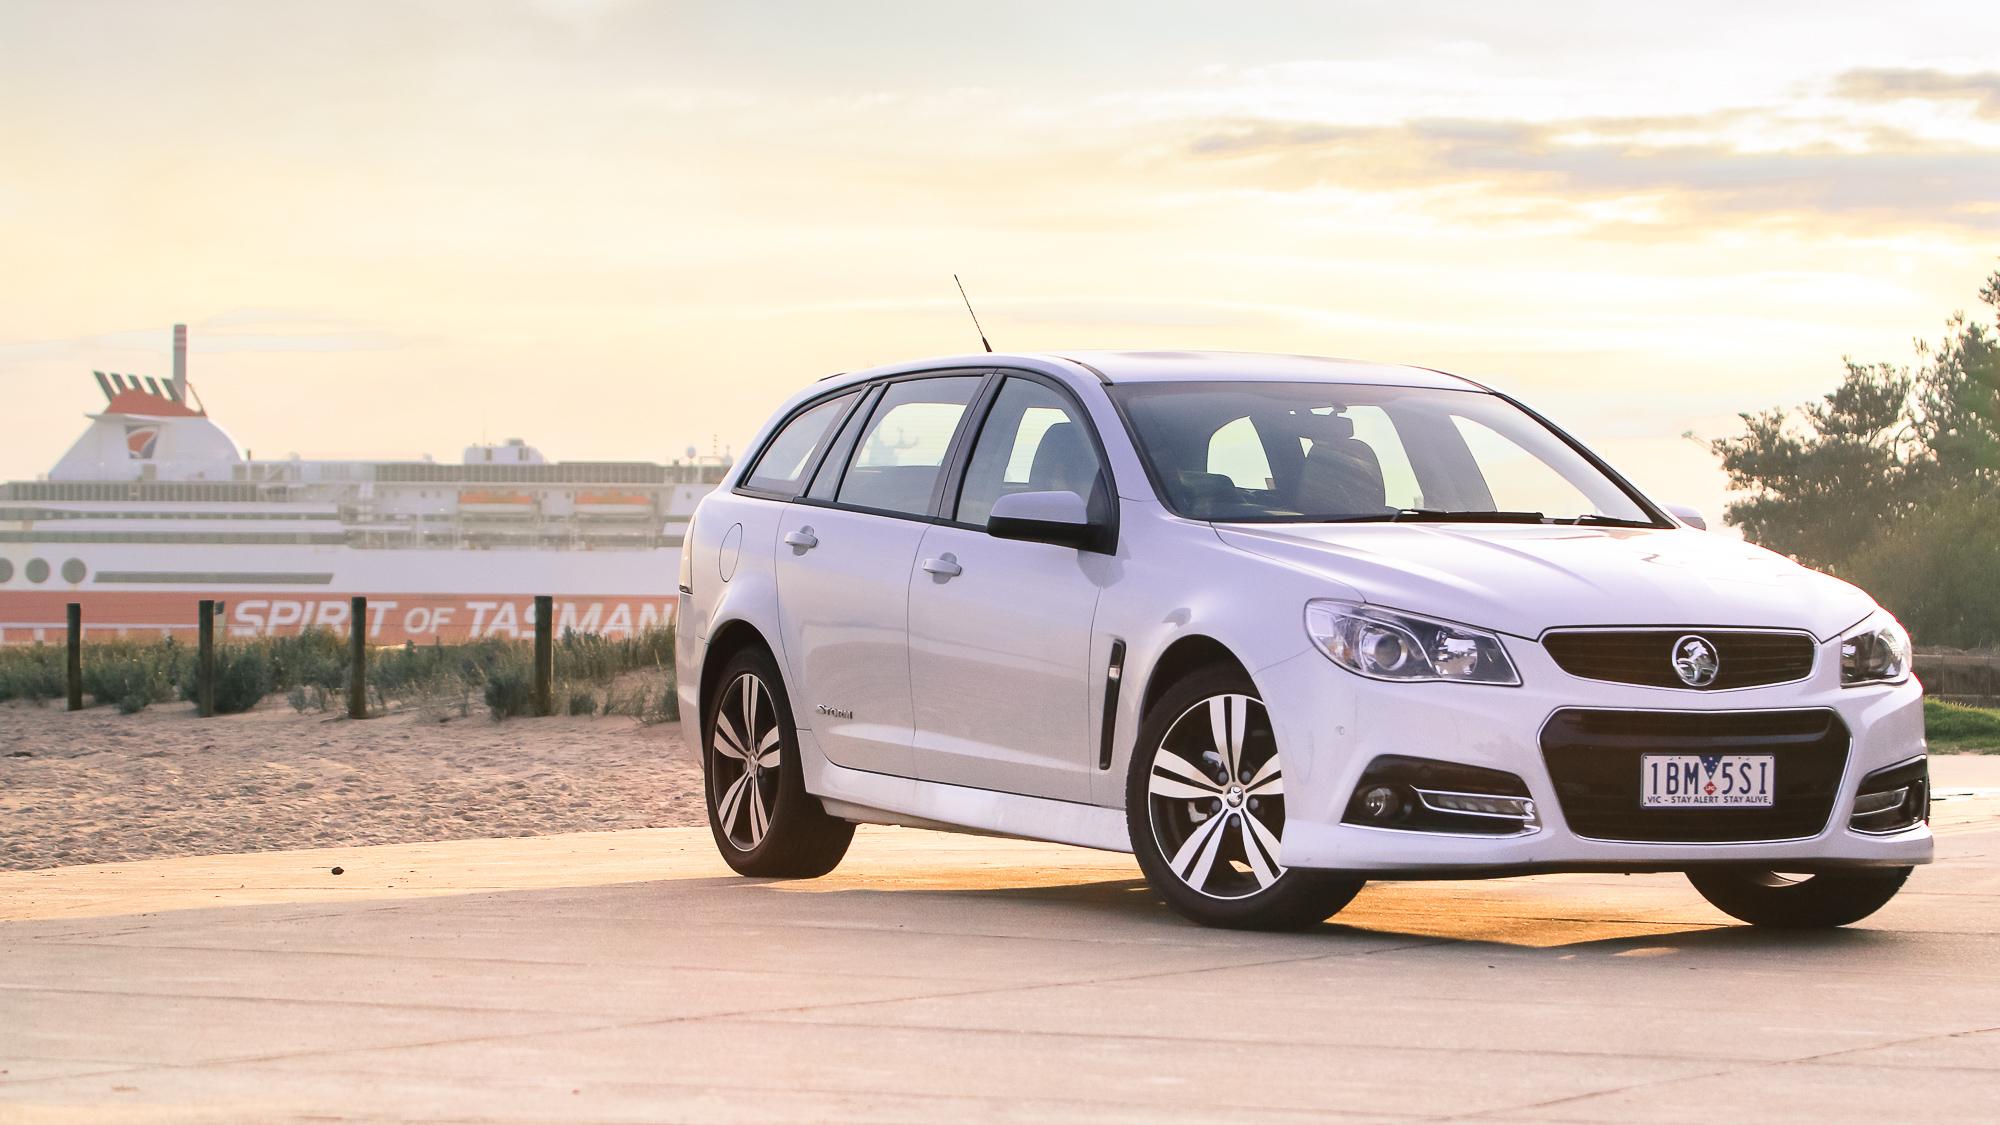 2014 Holden Commodore Sportwagon SV6 LPG Review - photos ...